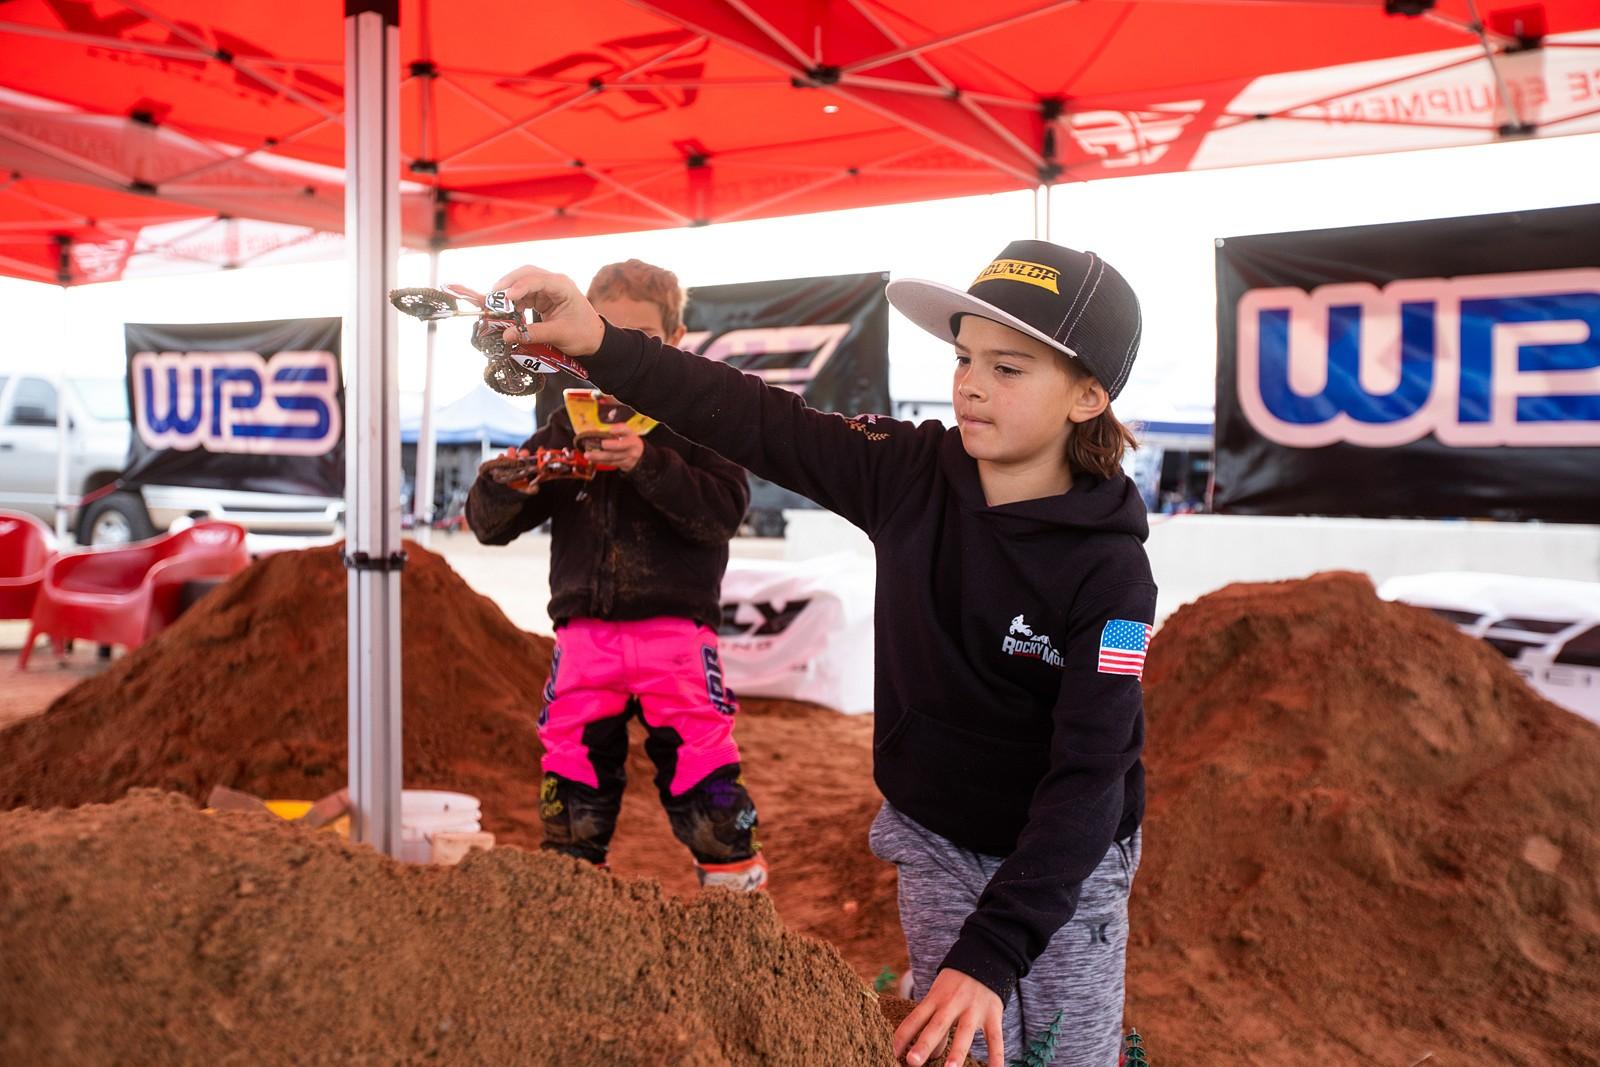 Toy dirt bike area - AZ Open of Motocross, Part 2 - Motocross Pictures - Vital MX